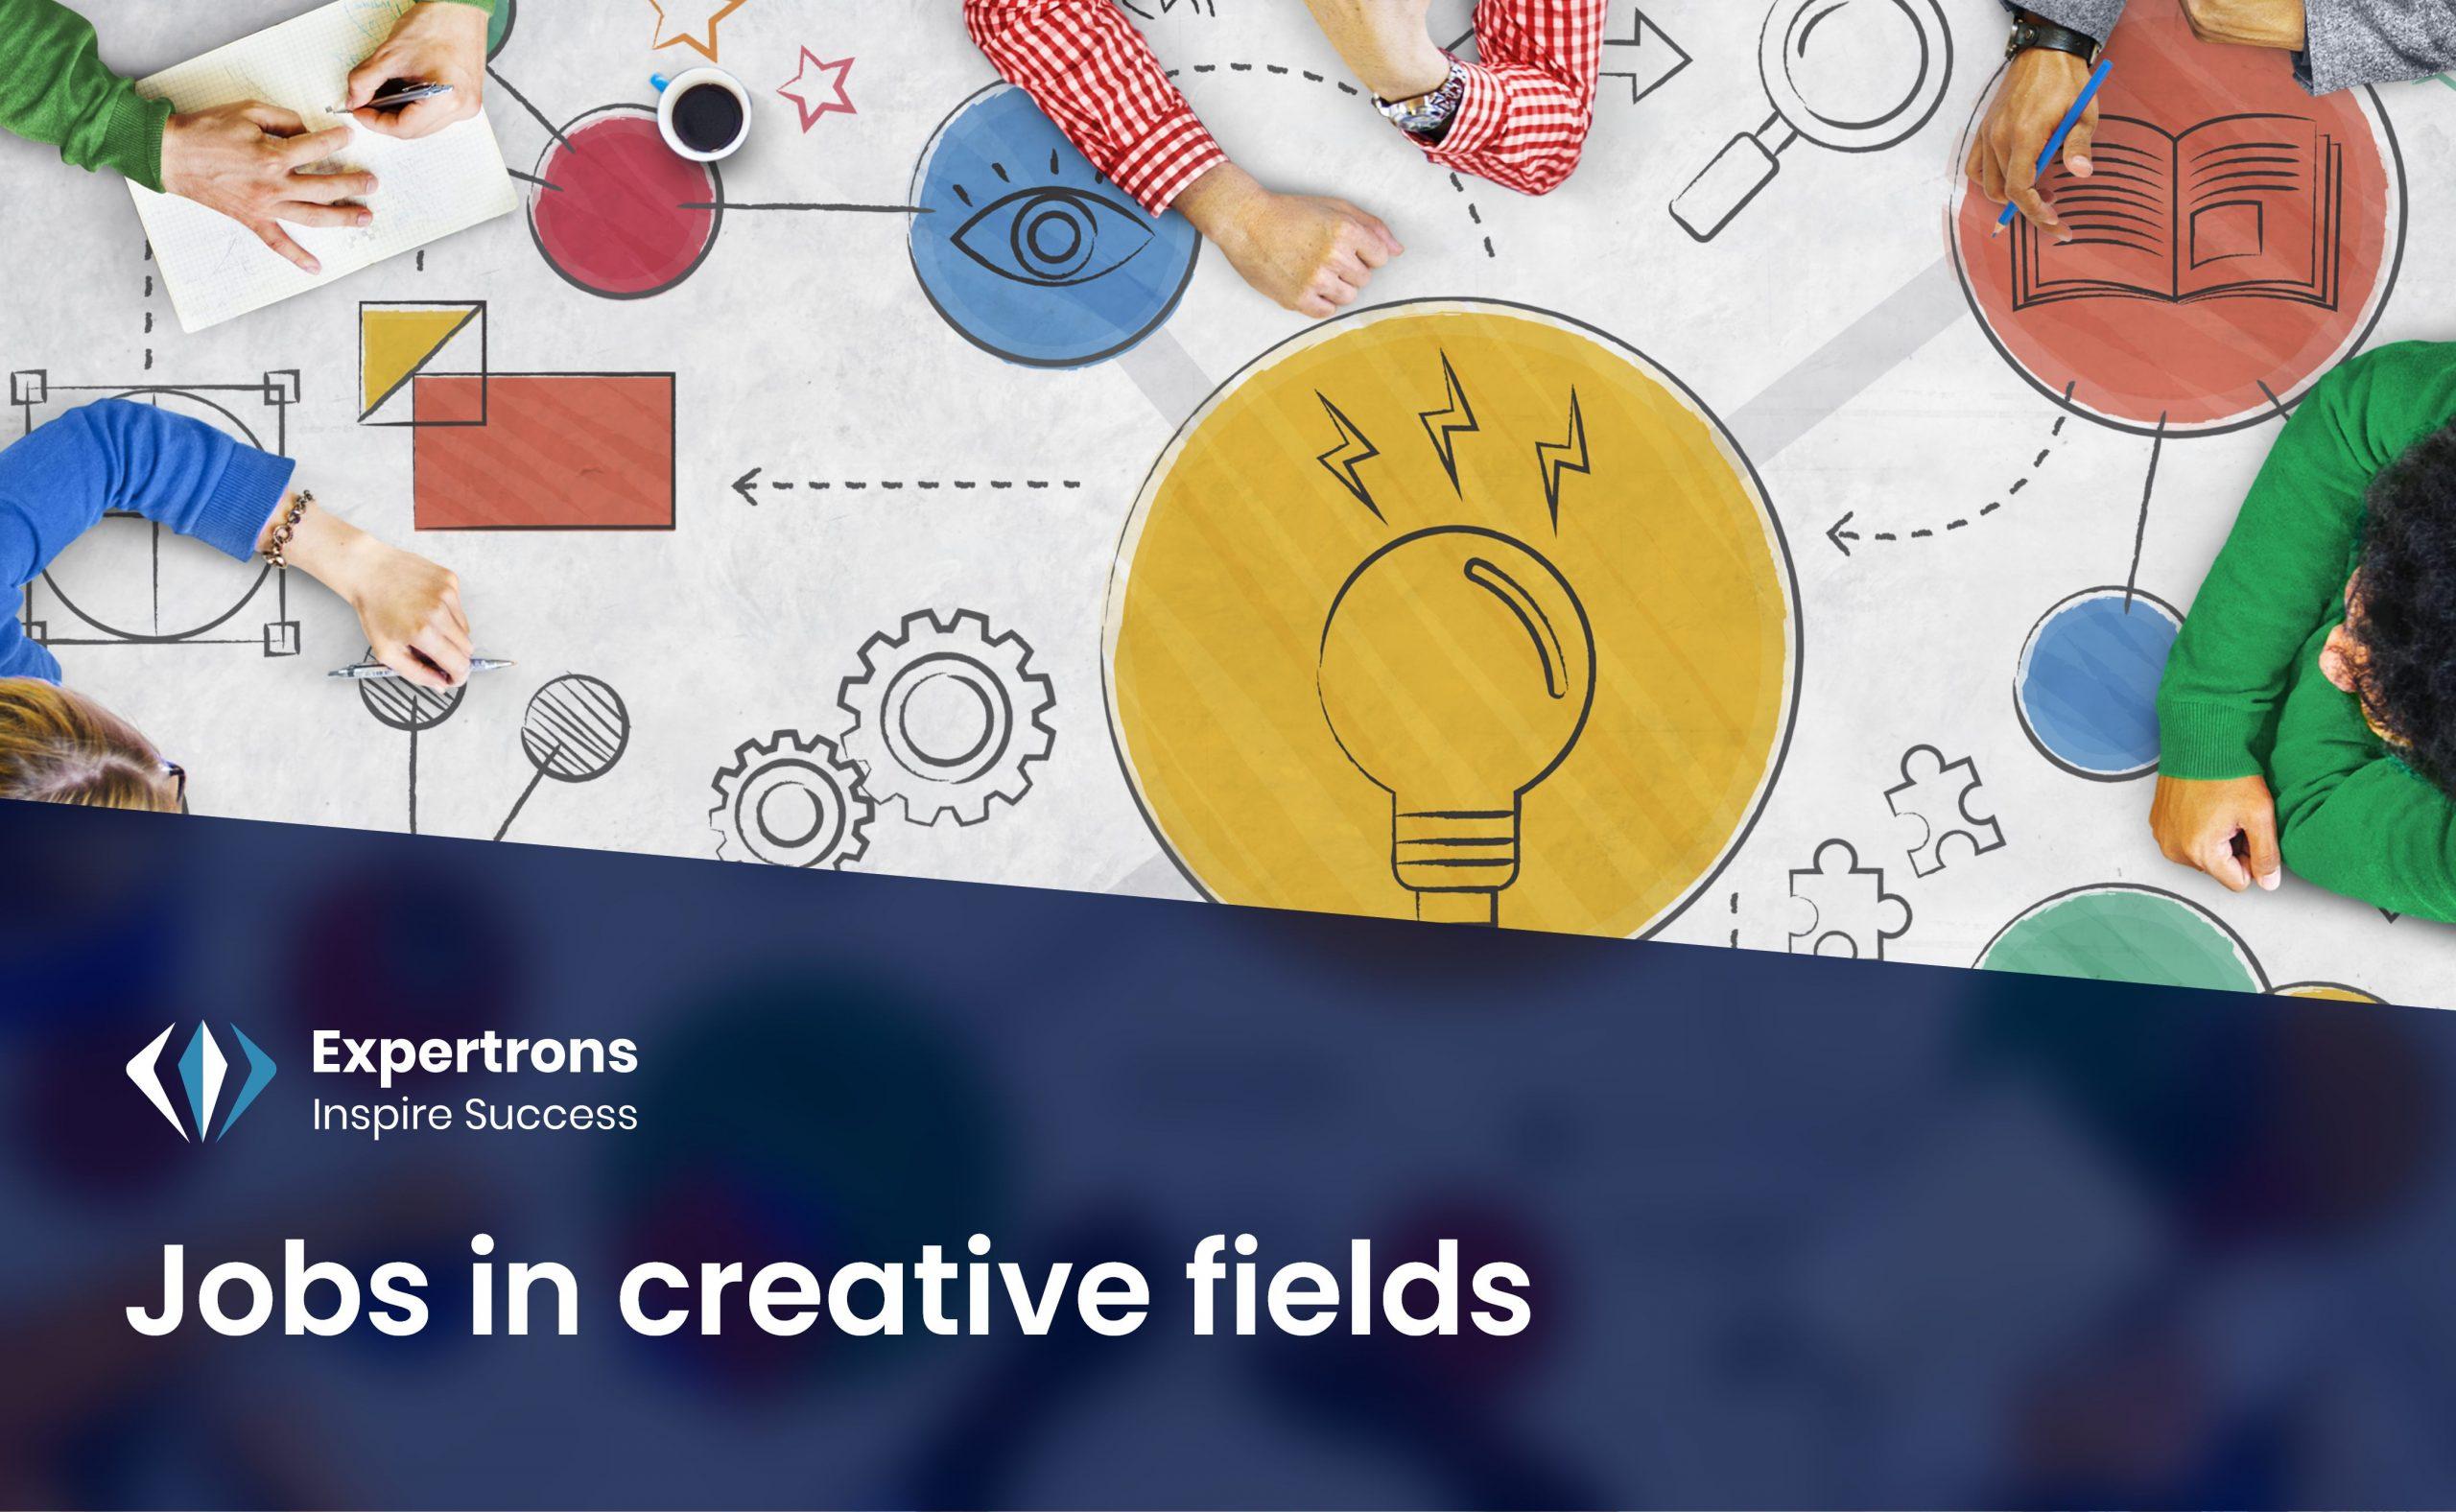 Jobs in Creative fields, creative job in mumbai, different career option, creative job in india, full creative careers, interesting career options, jobs in creative fields.